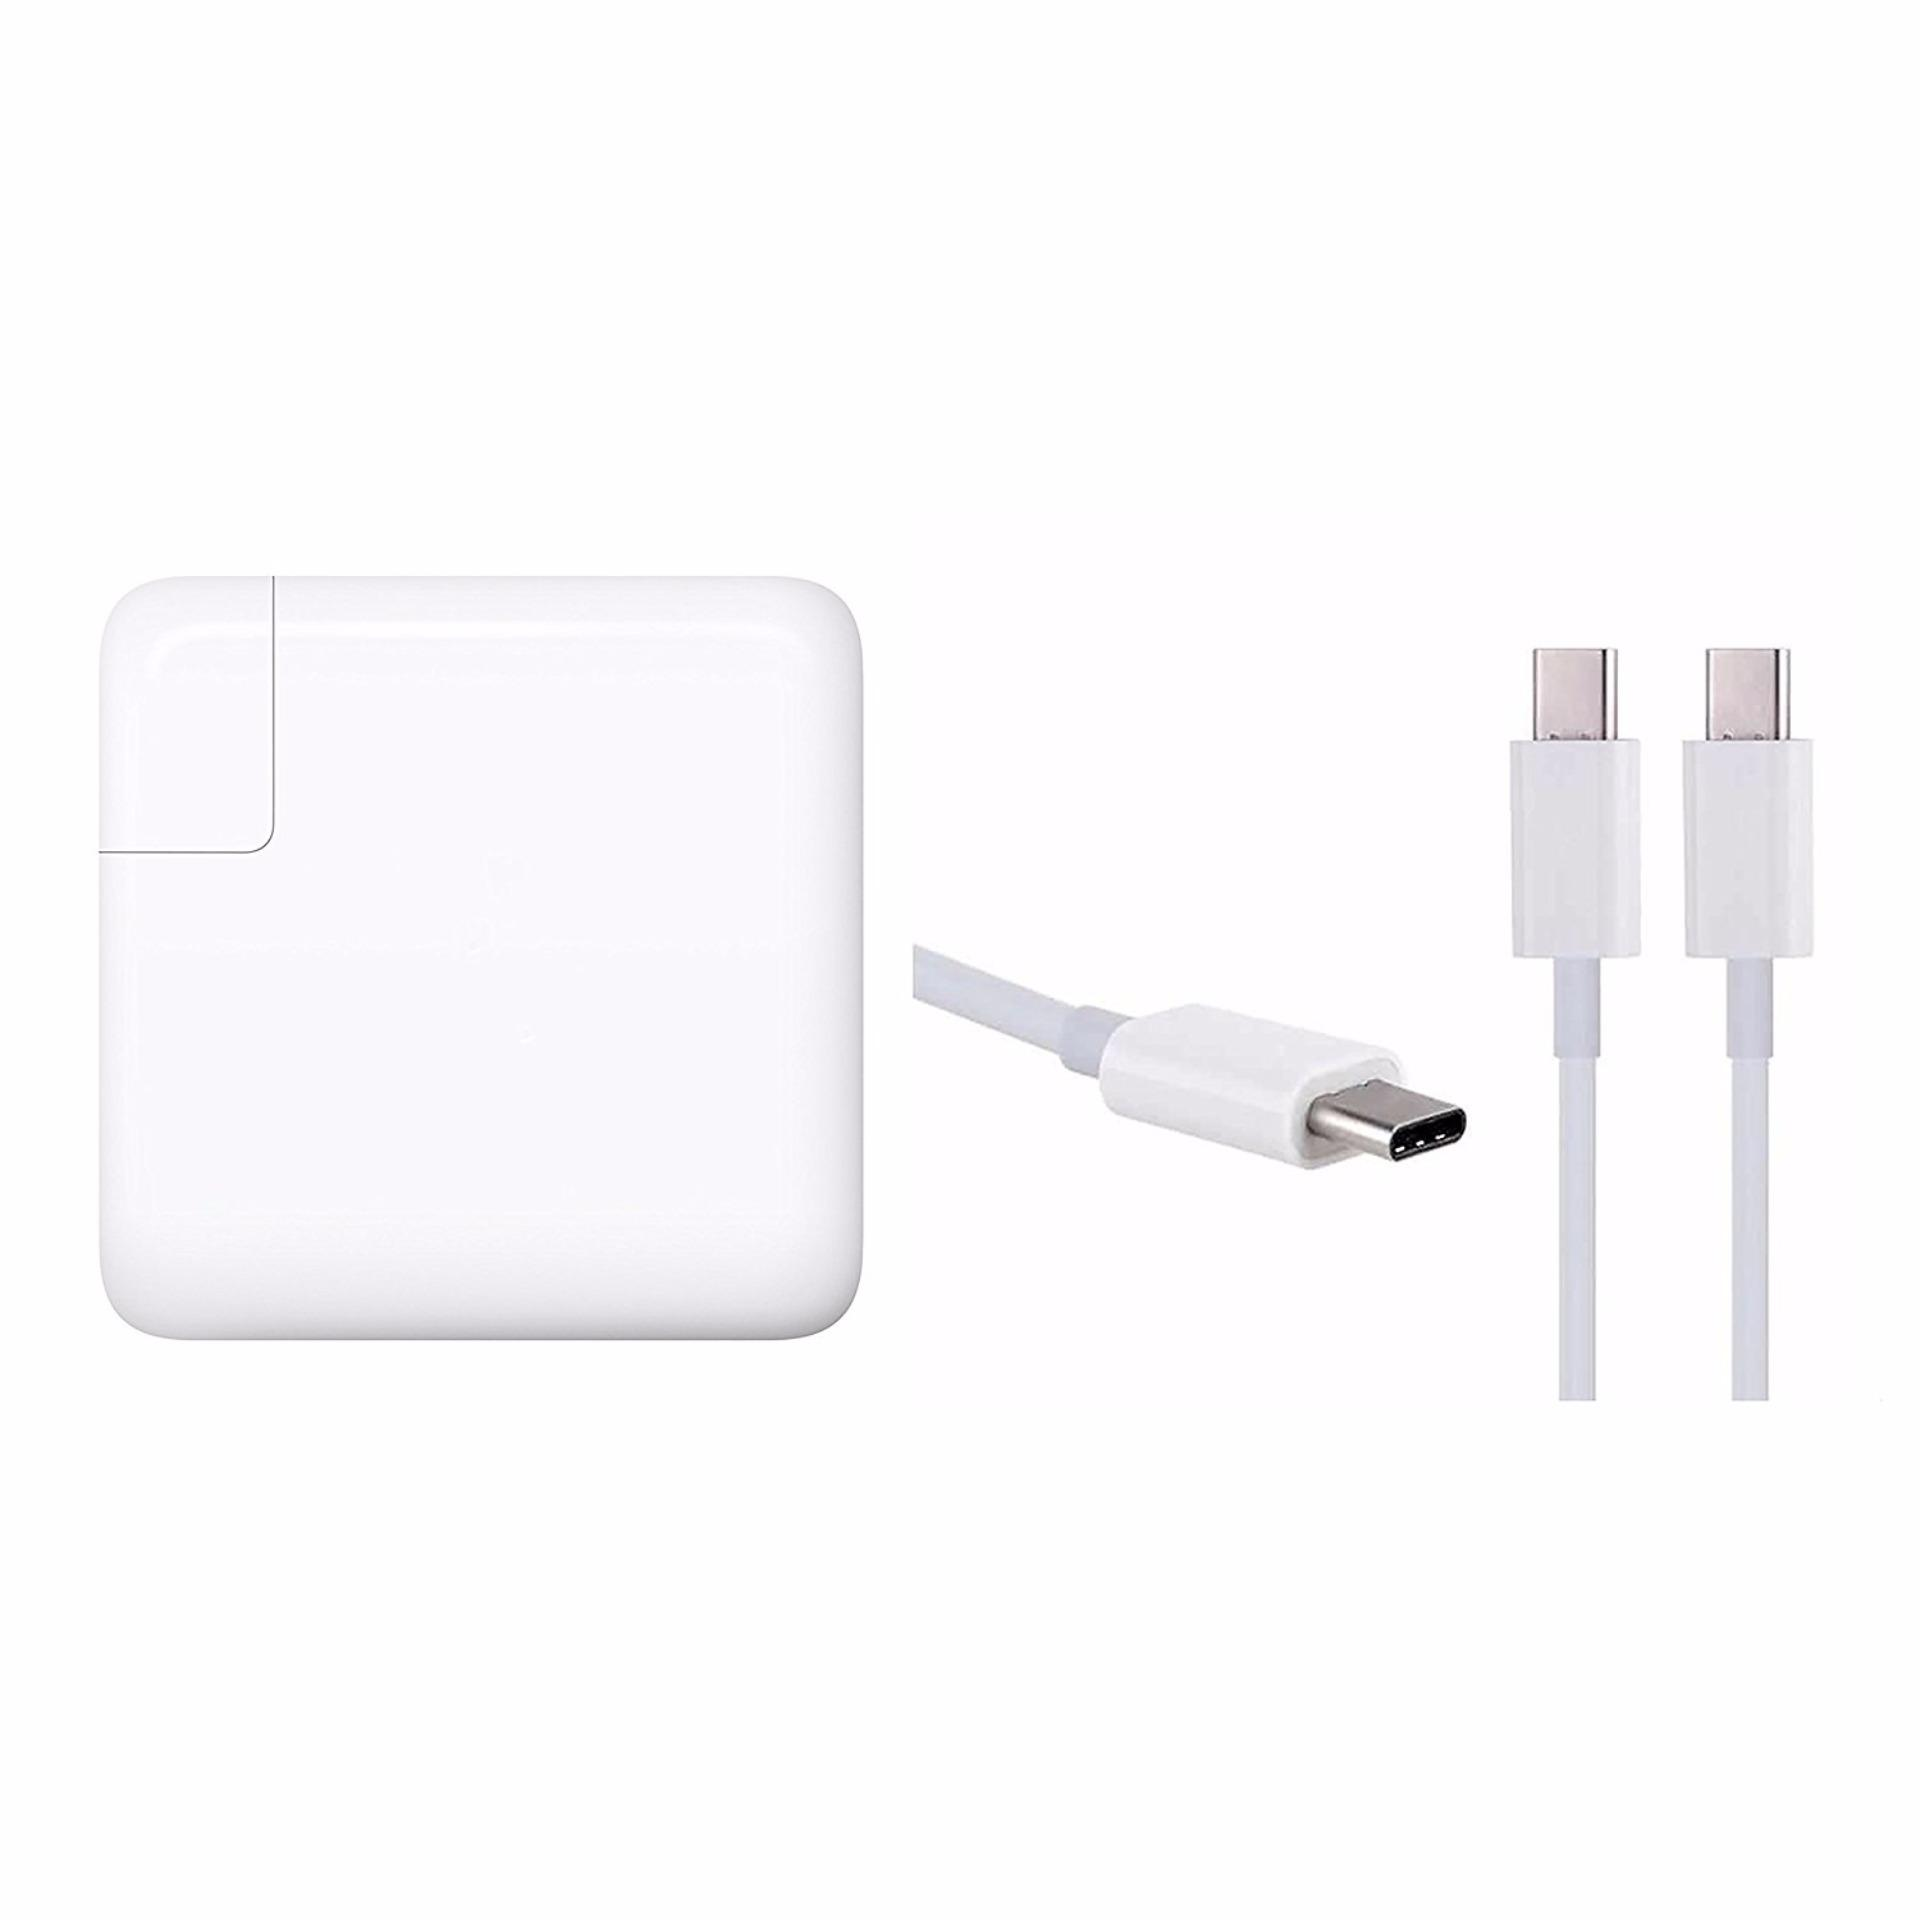 Bộ sạc Macbook USB Type C cho Macbook Pro Retina 15 inches 87W